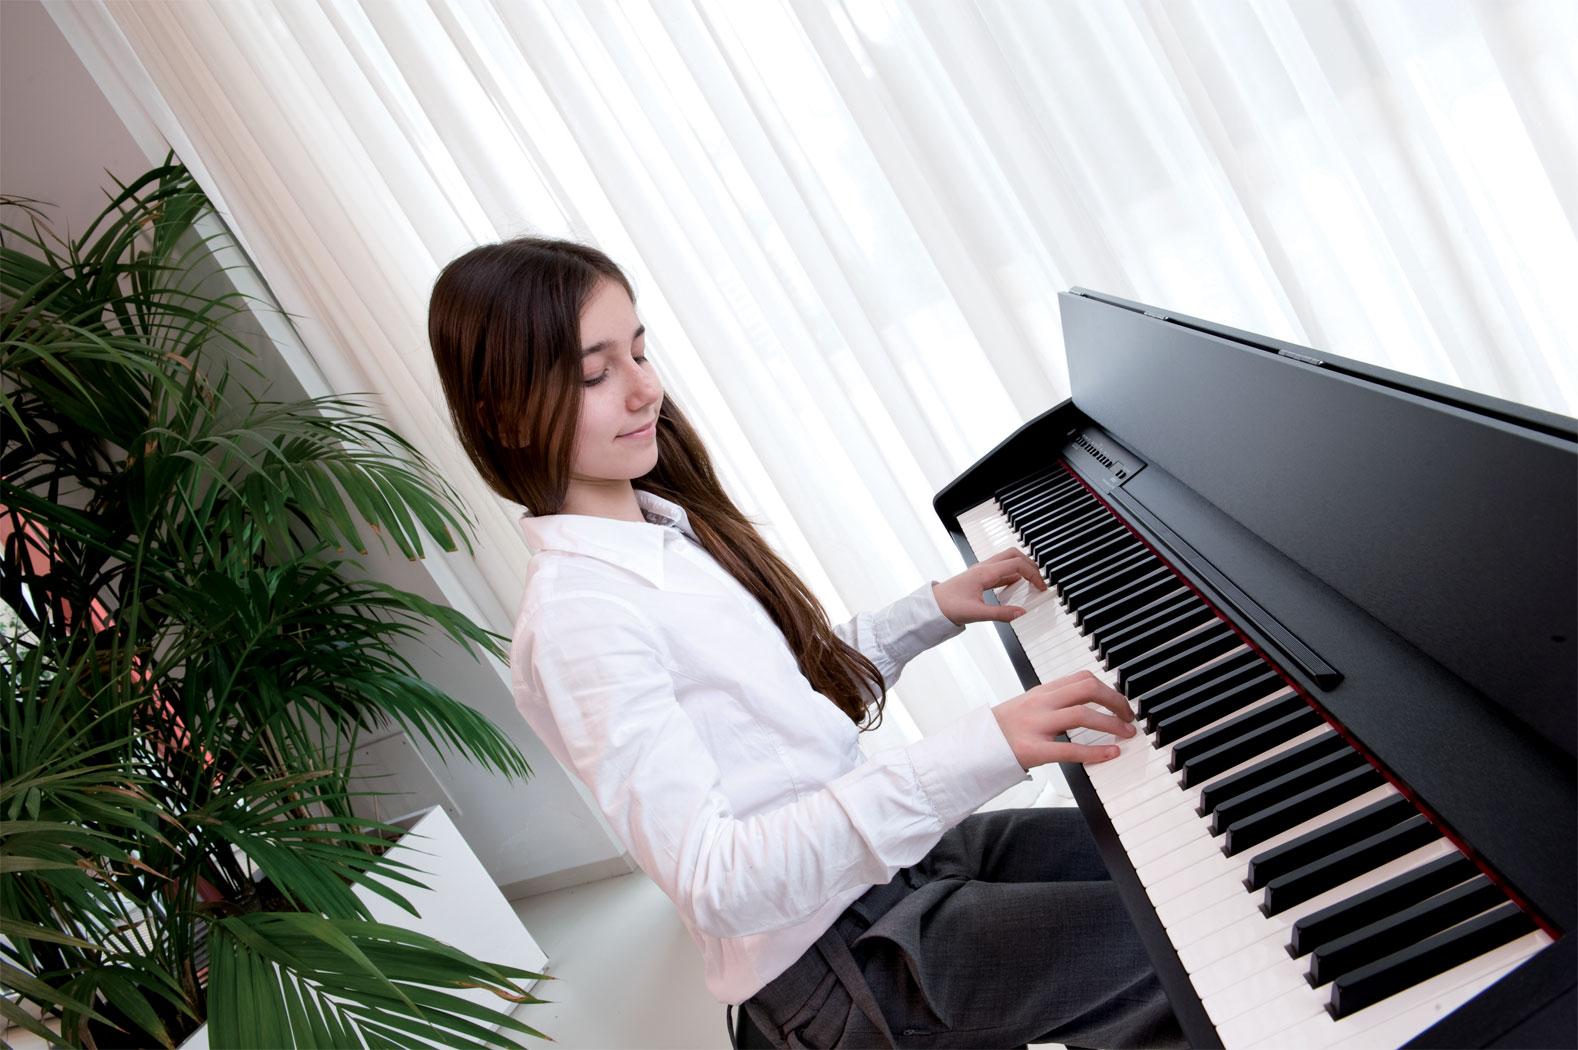 ban-dan-piano-gia-re-tai-tphcm.1